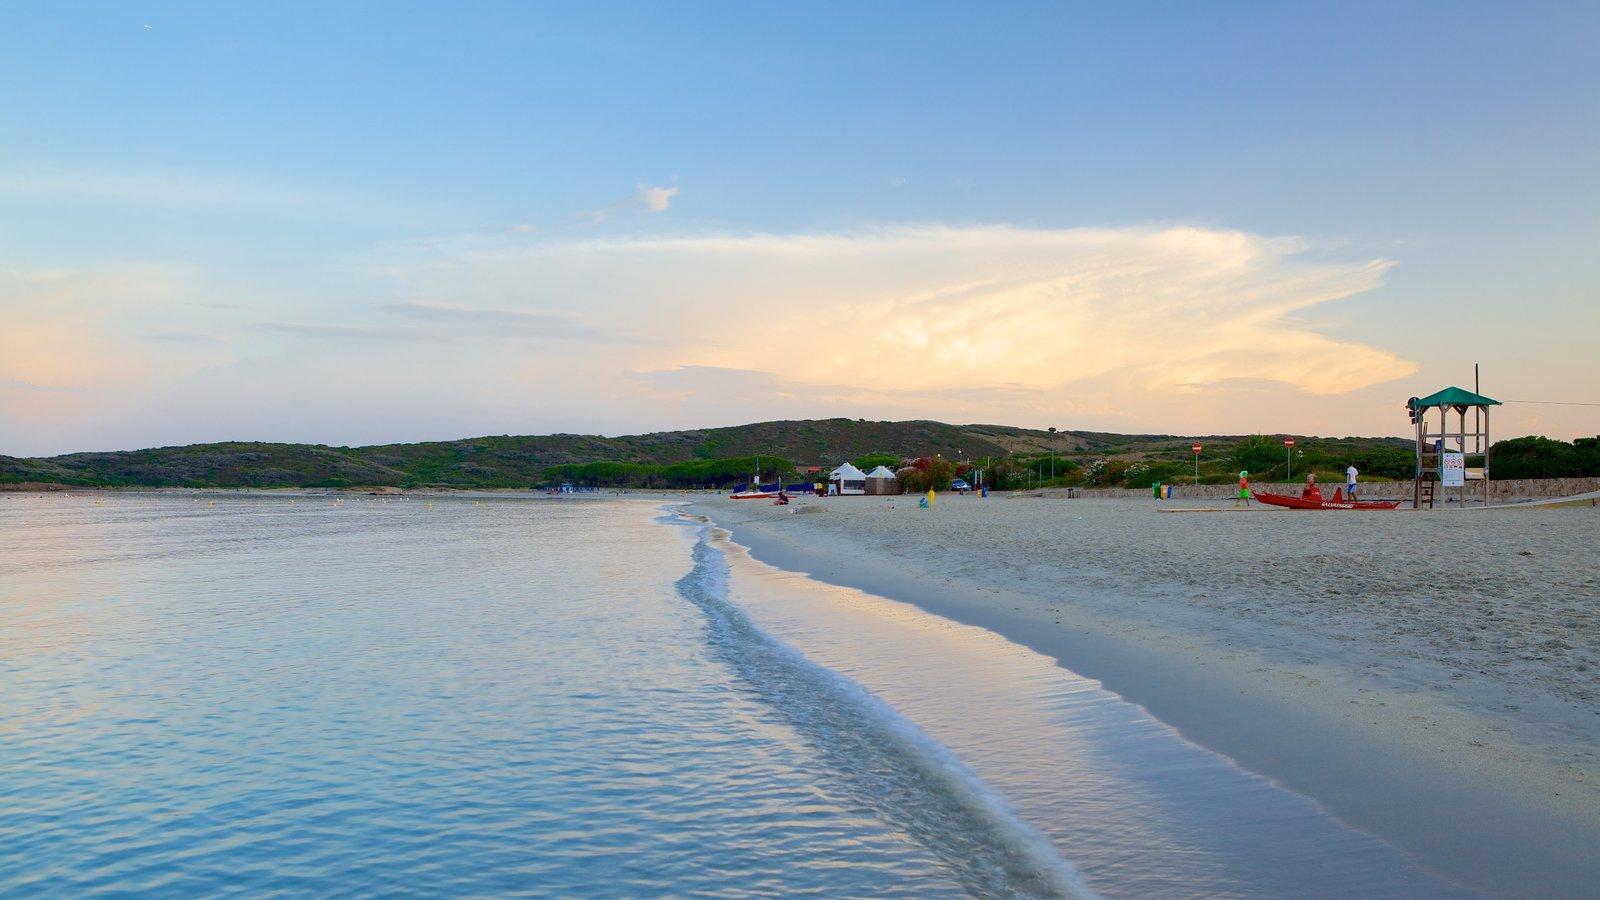 Pittulongu Beach showing a beach